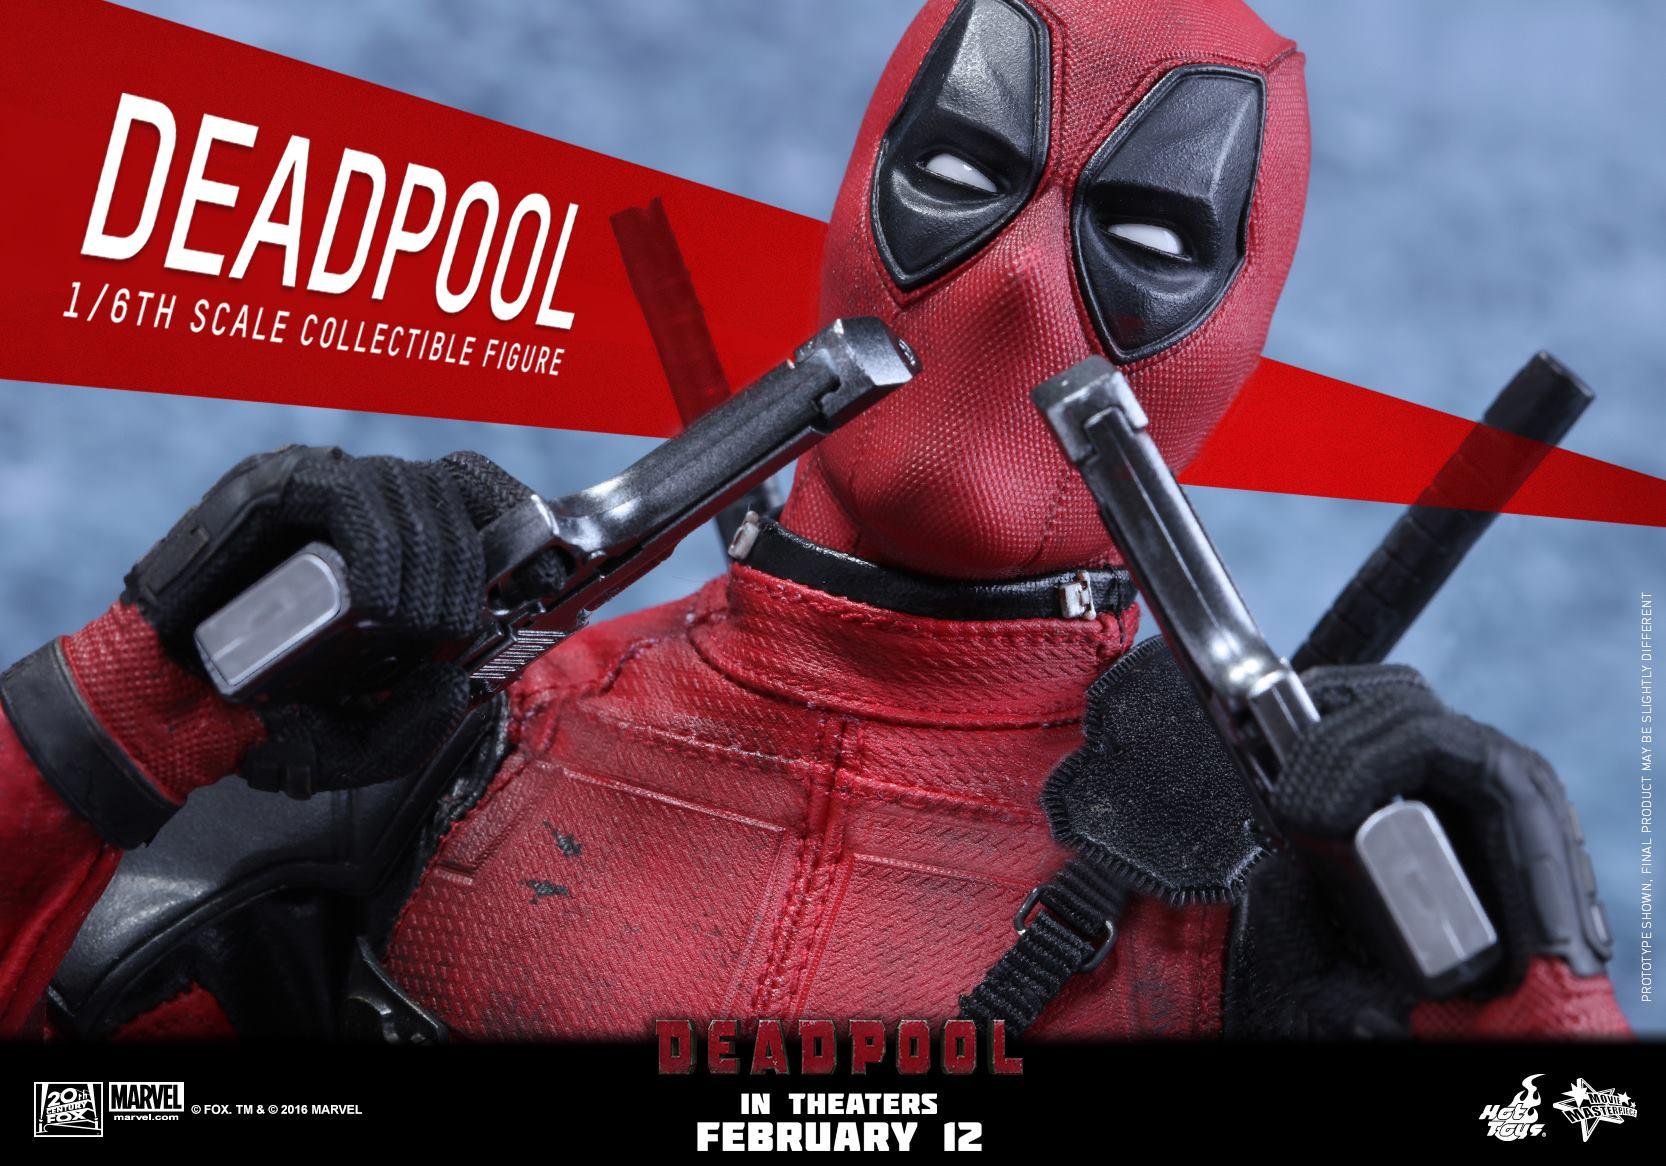 https://marveltoynews.com/wp-content/uploads/2016/01/MMS-347-Deadpool-Hot-Toys-Movie-Masterpiece-Series-Figure.jpg